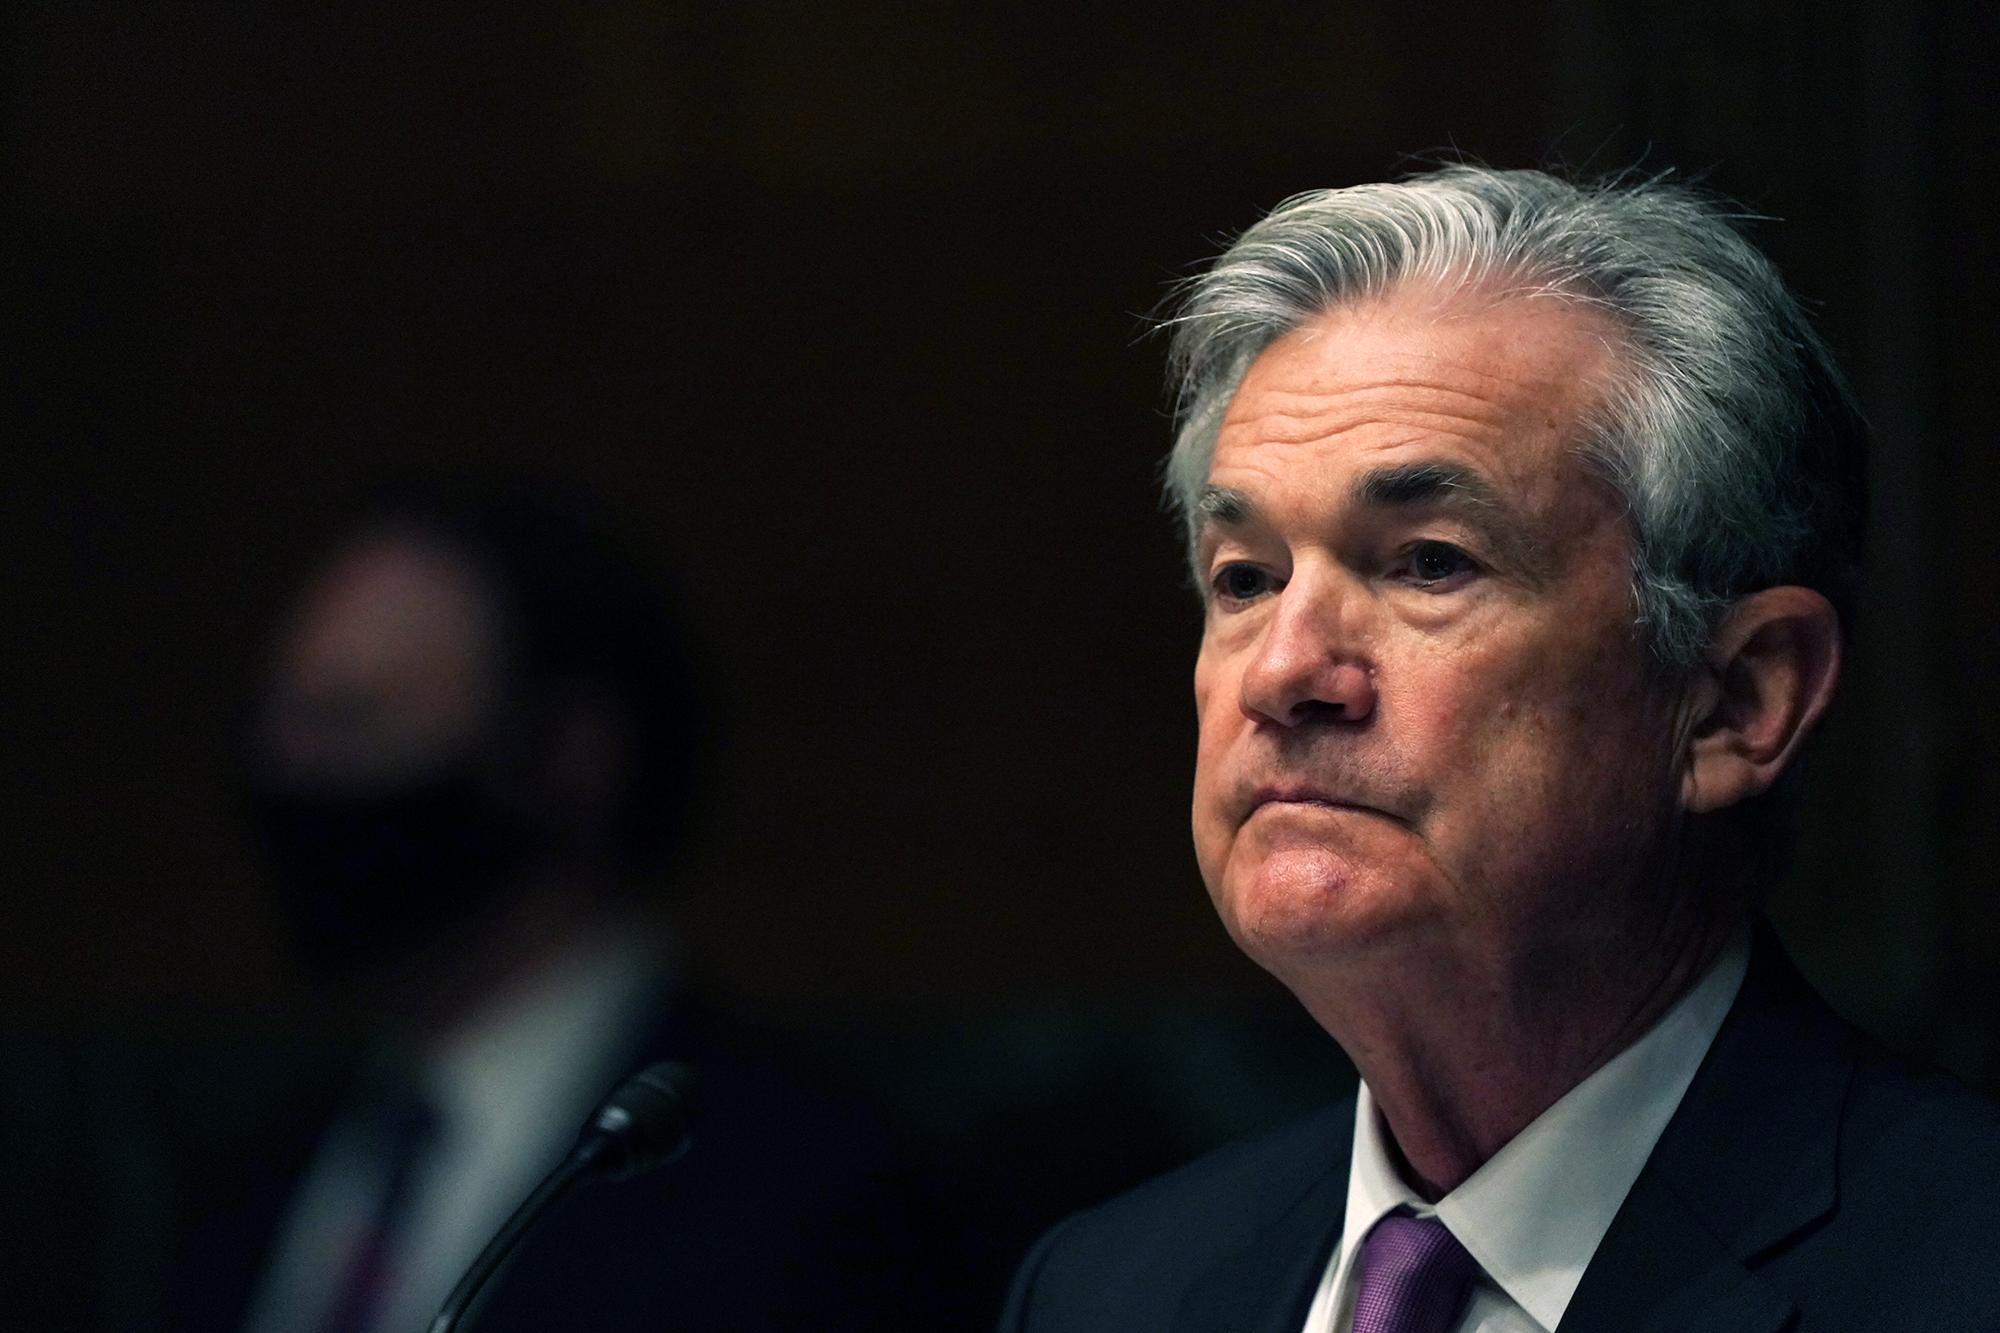 Interest rates near zero are a big gift — for Biden or Trump